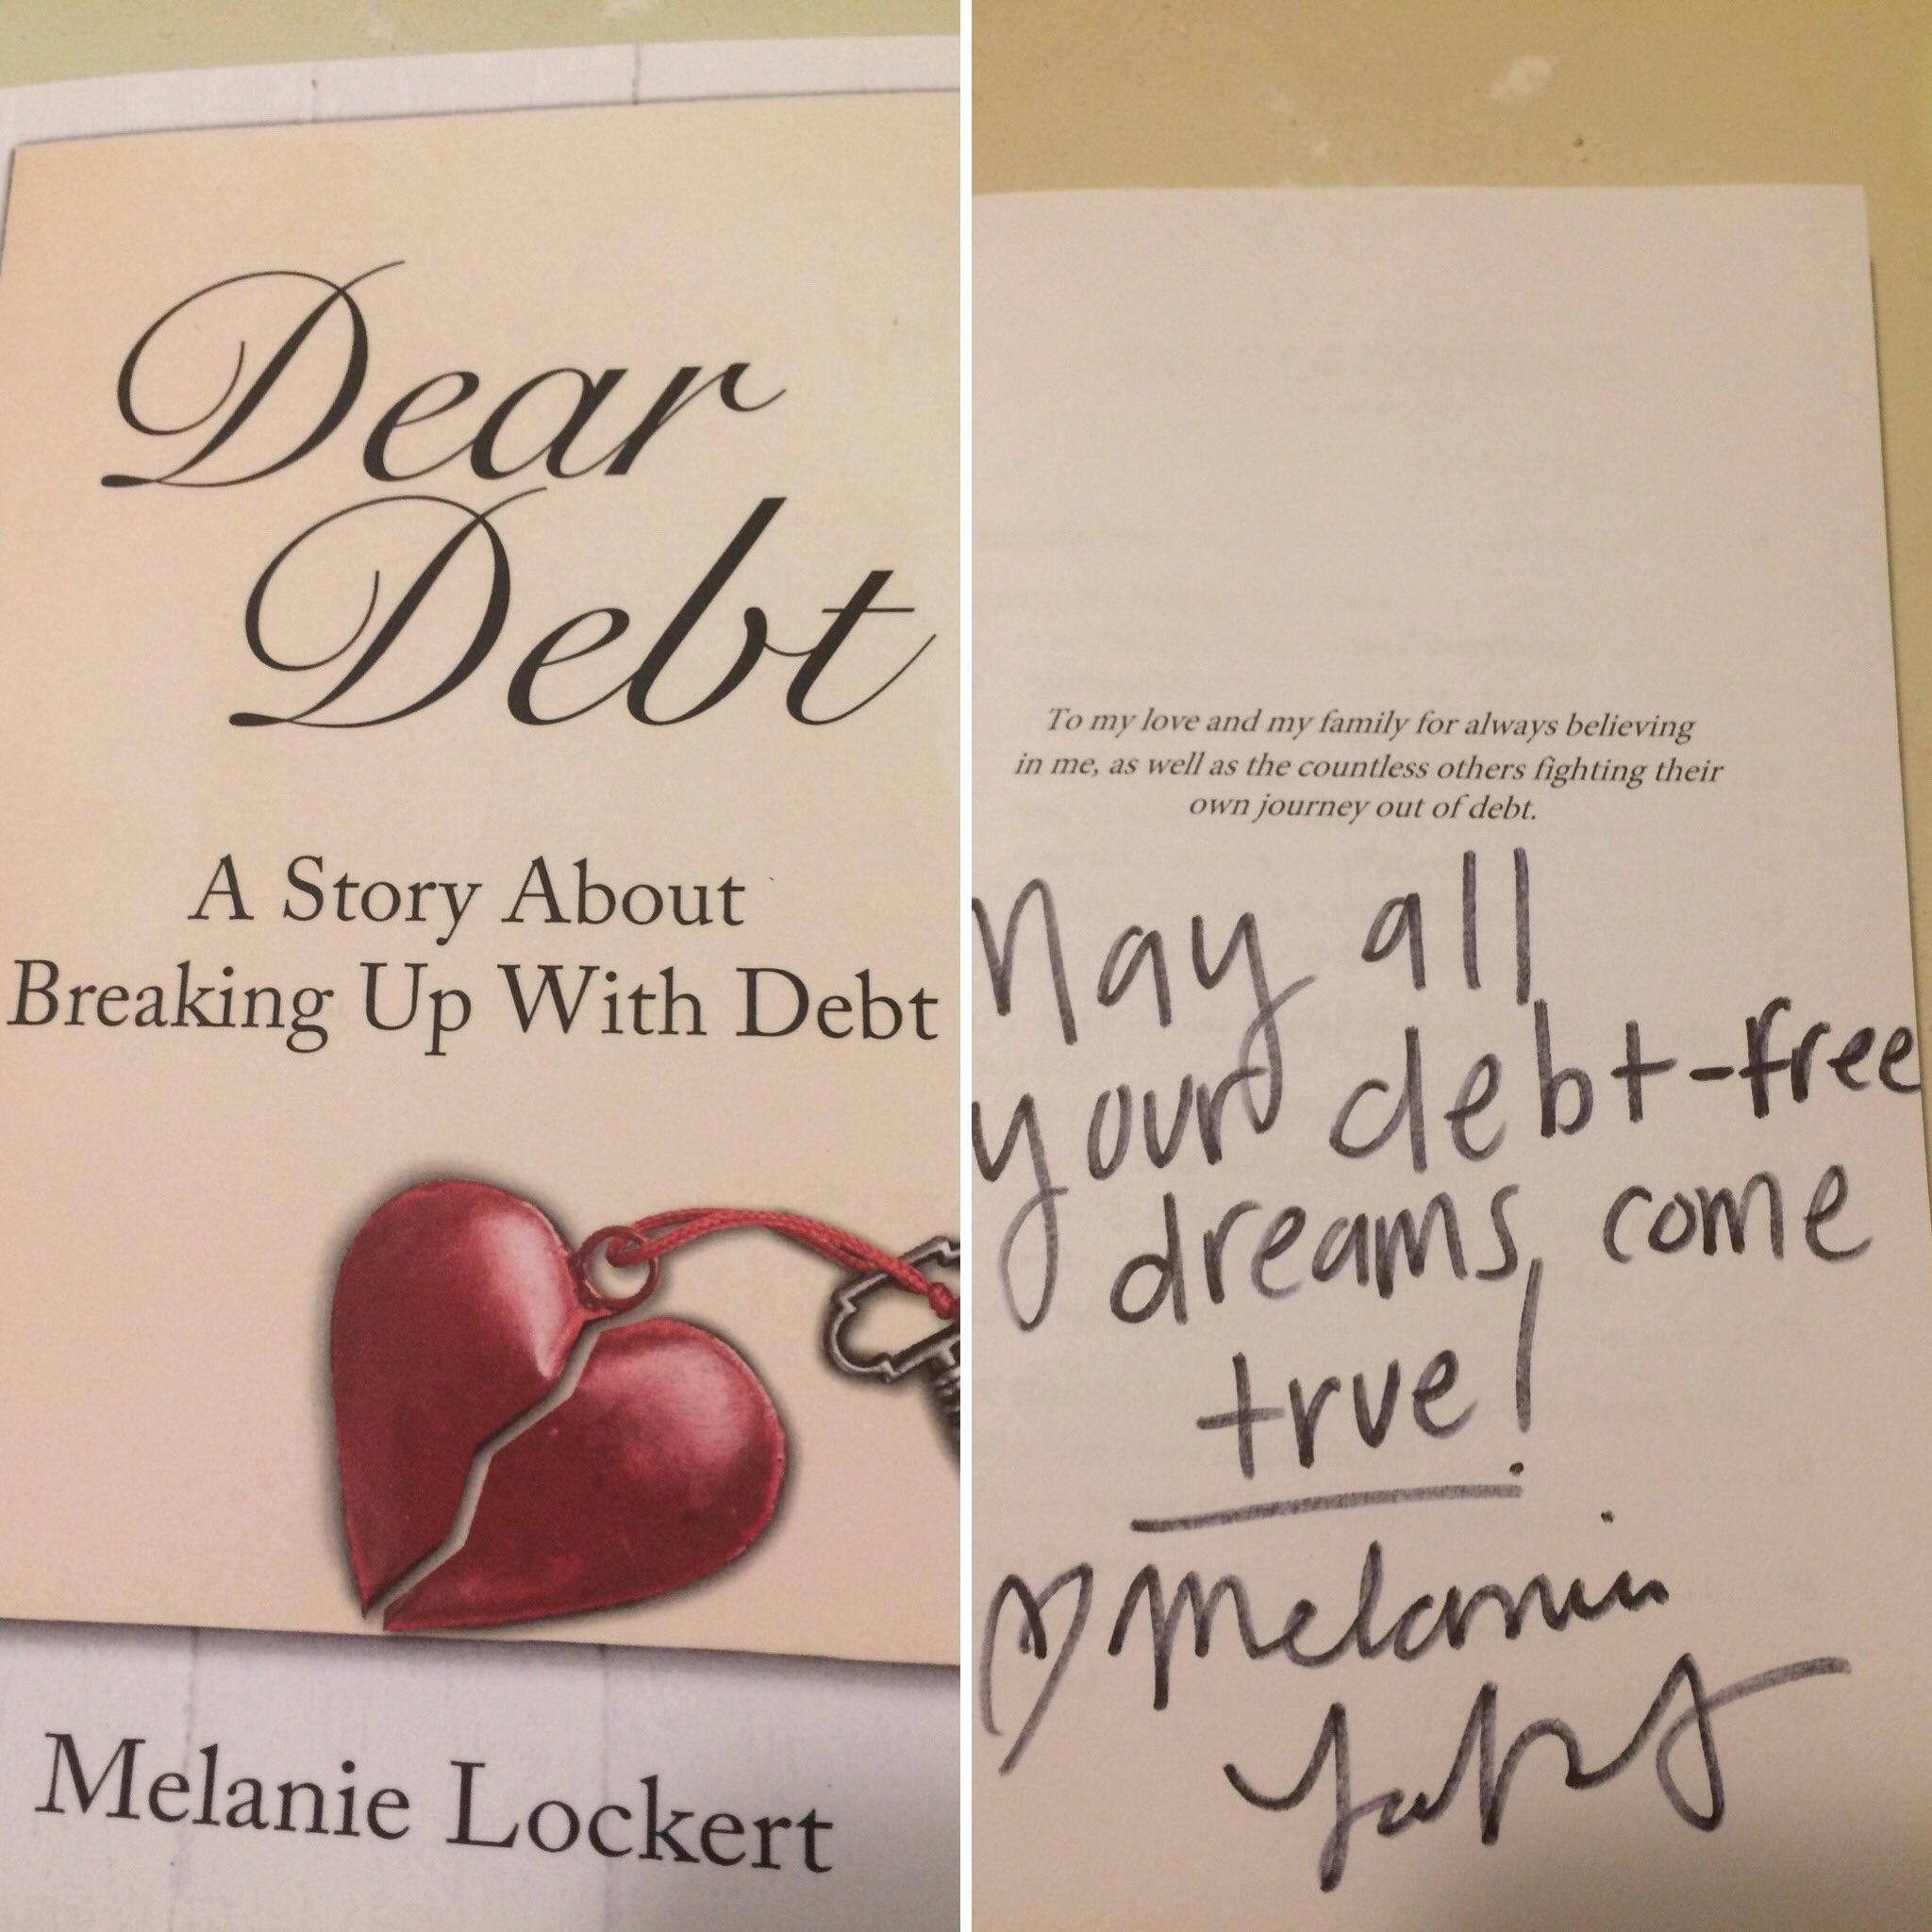 dear-debt